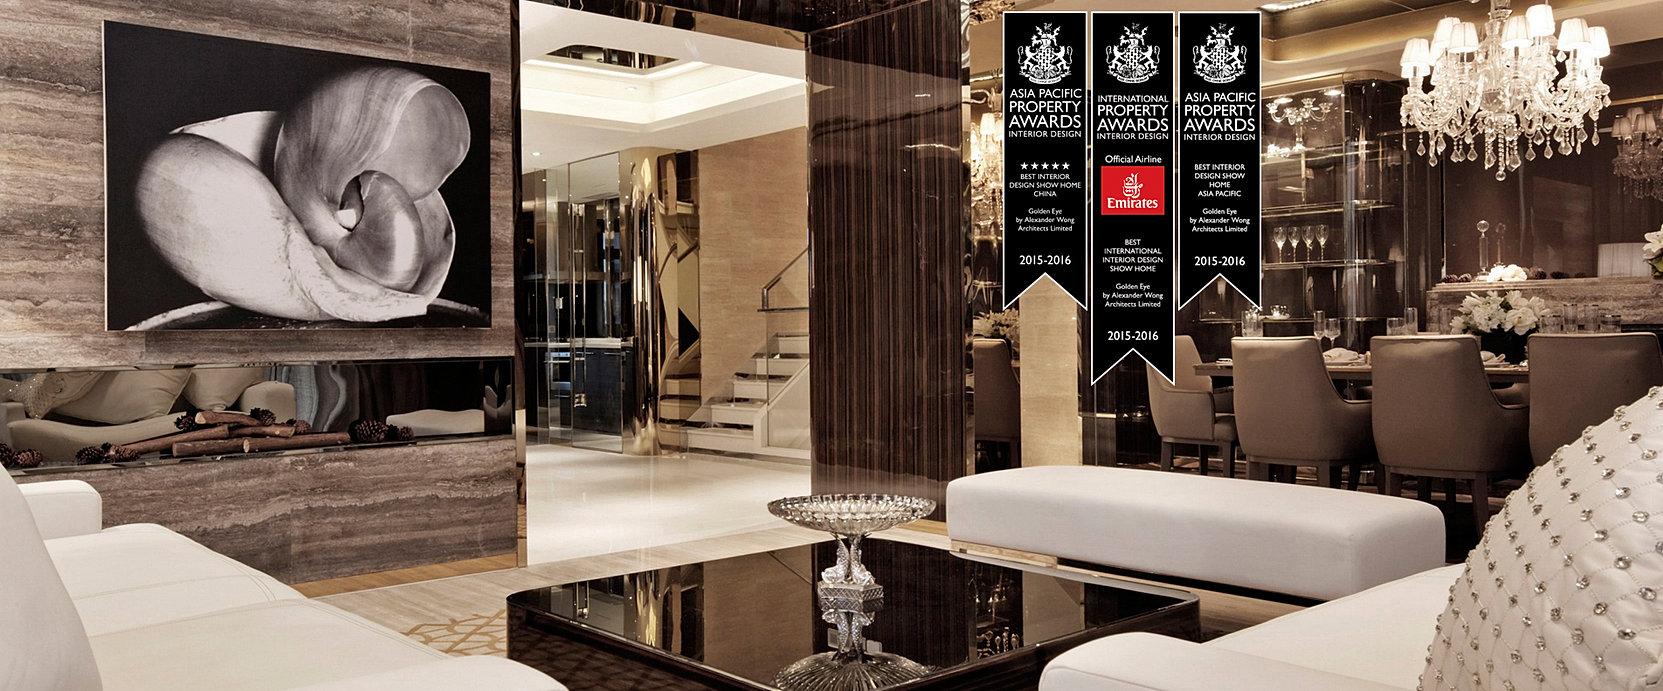 Alexander wong architects awards winning interior design - International interior designers ...